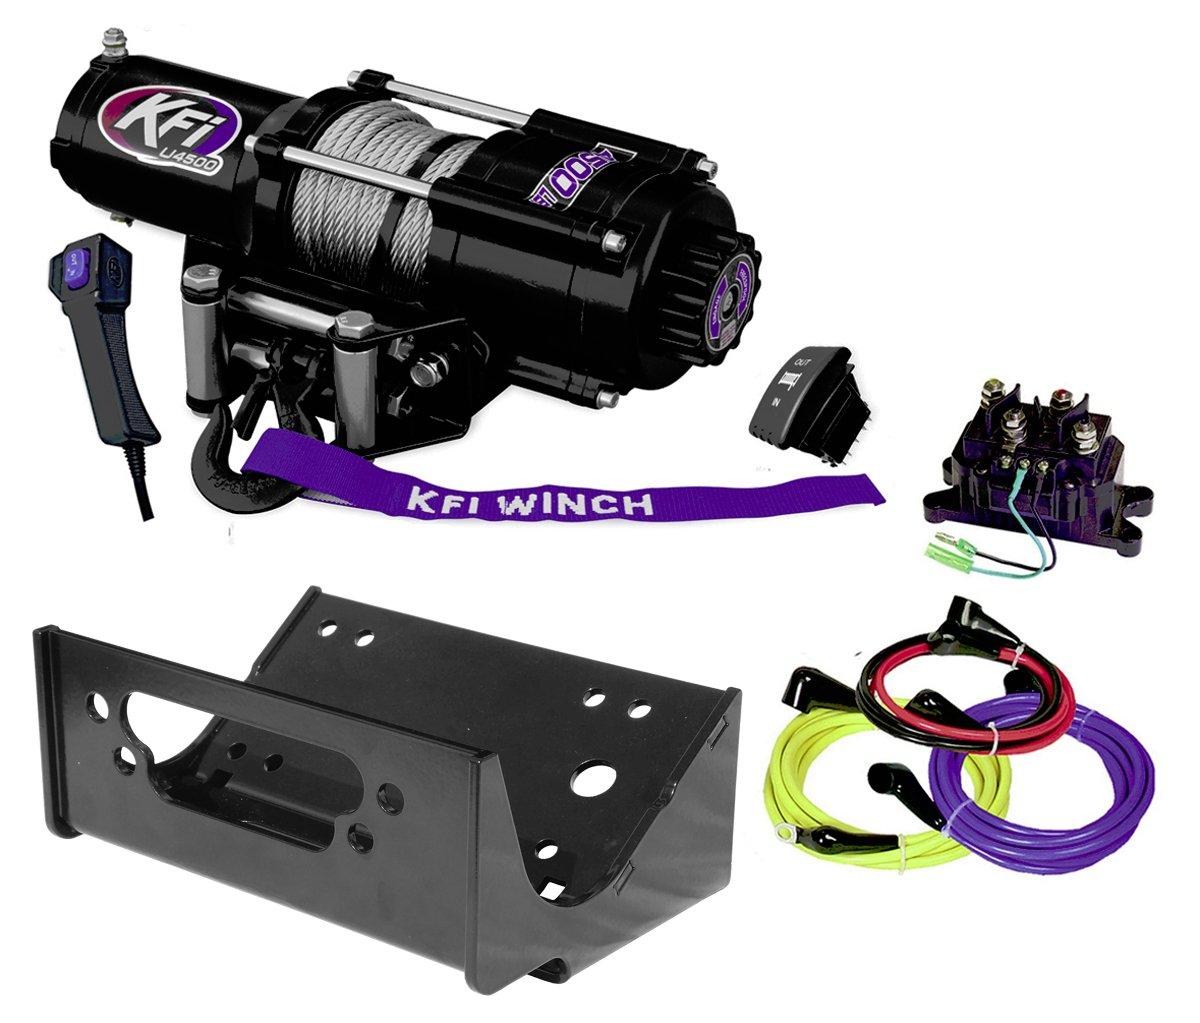 KFI Combo Kit - U45-R2 4500lbs Winch & Mount Bracket - 2012-2013 Kawasaki Teryx4 750 & 2014-2018 Teryx & Teryx4 800